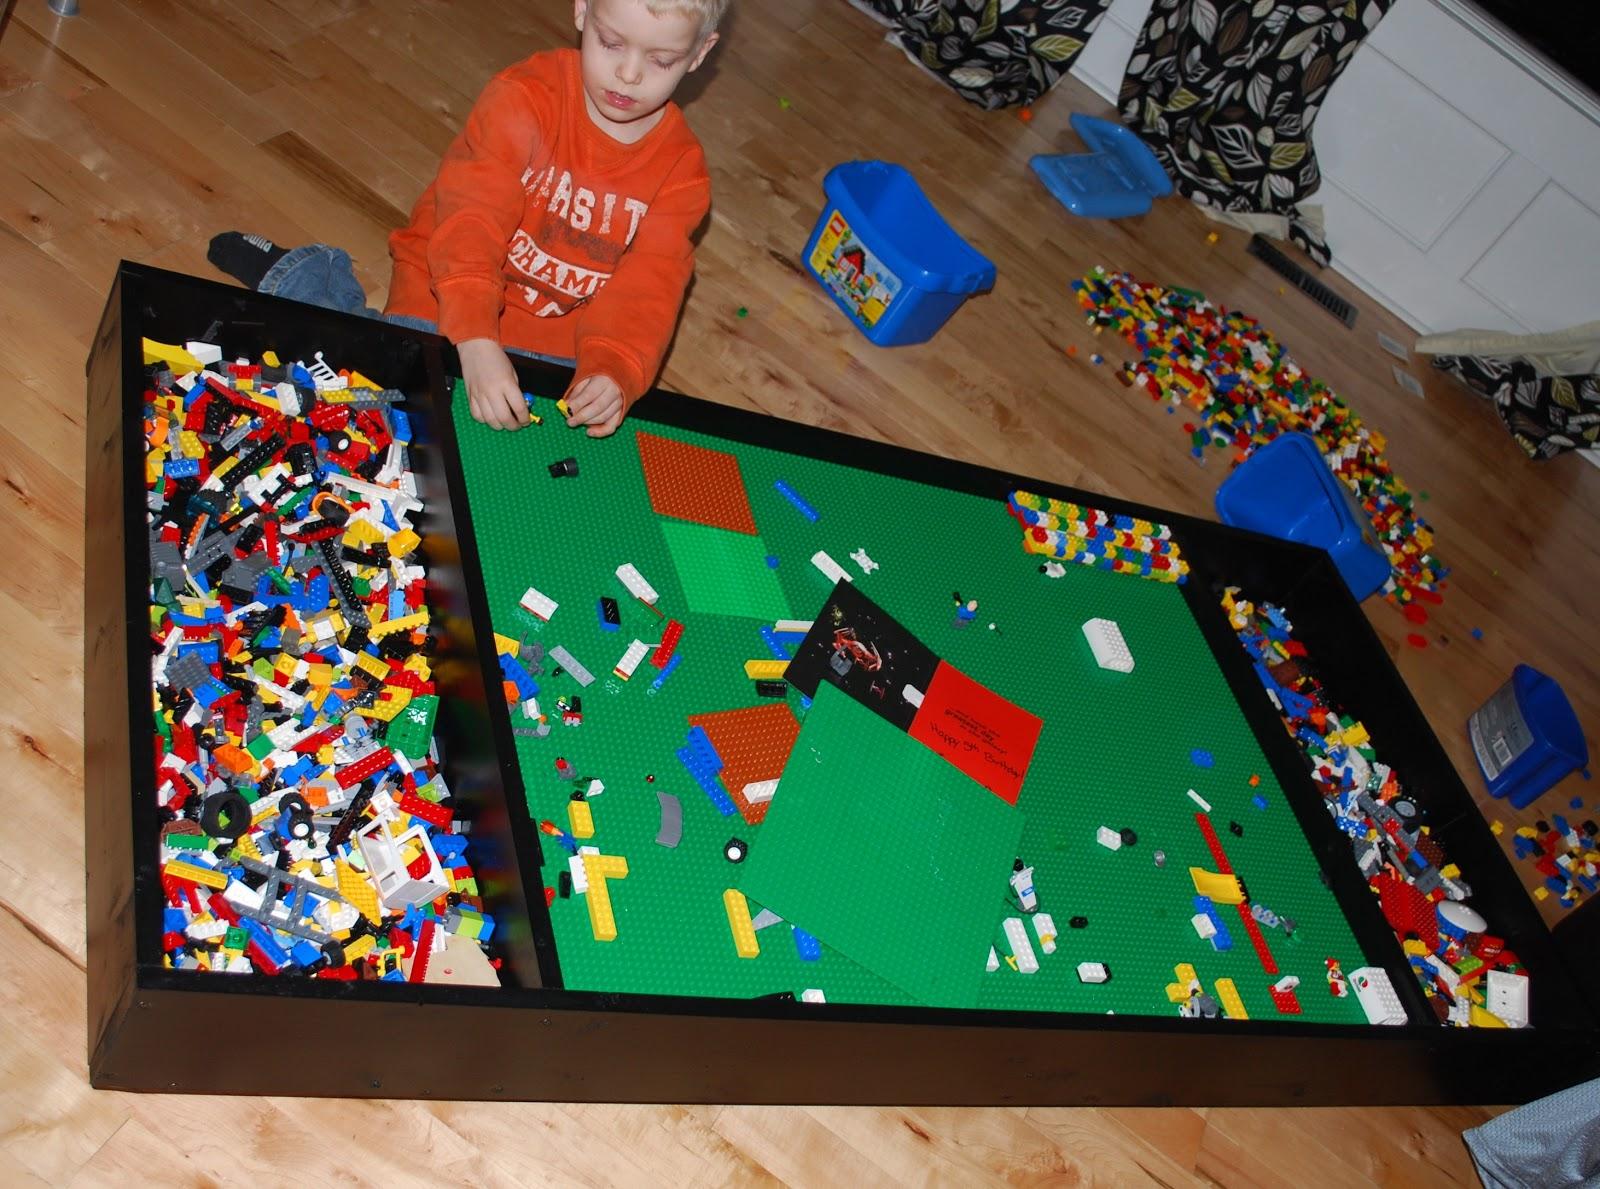 35 diy lego table storage ideas you simply cant resist 32 33 solutioingenieria Gallery